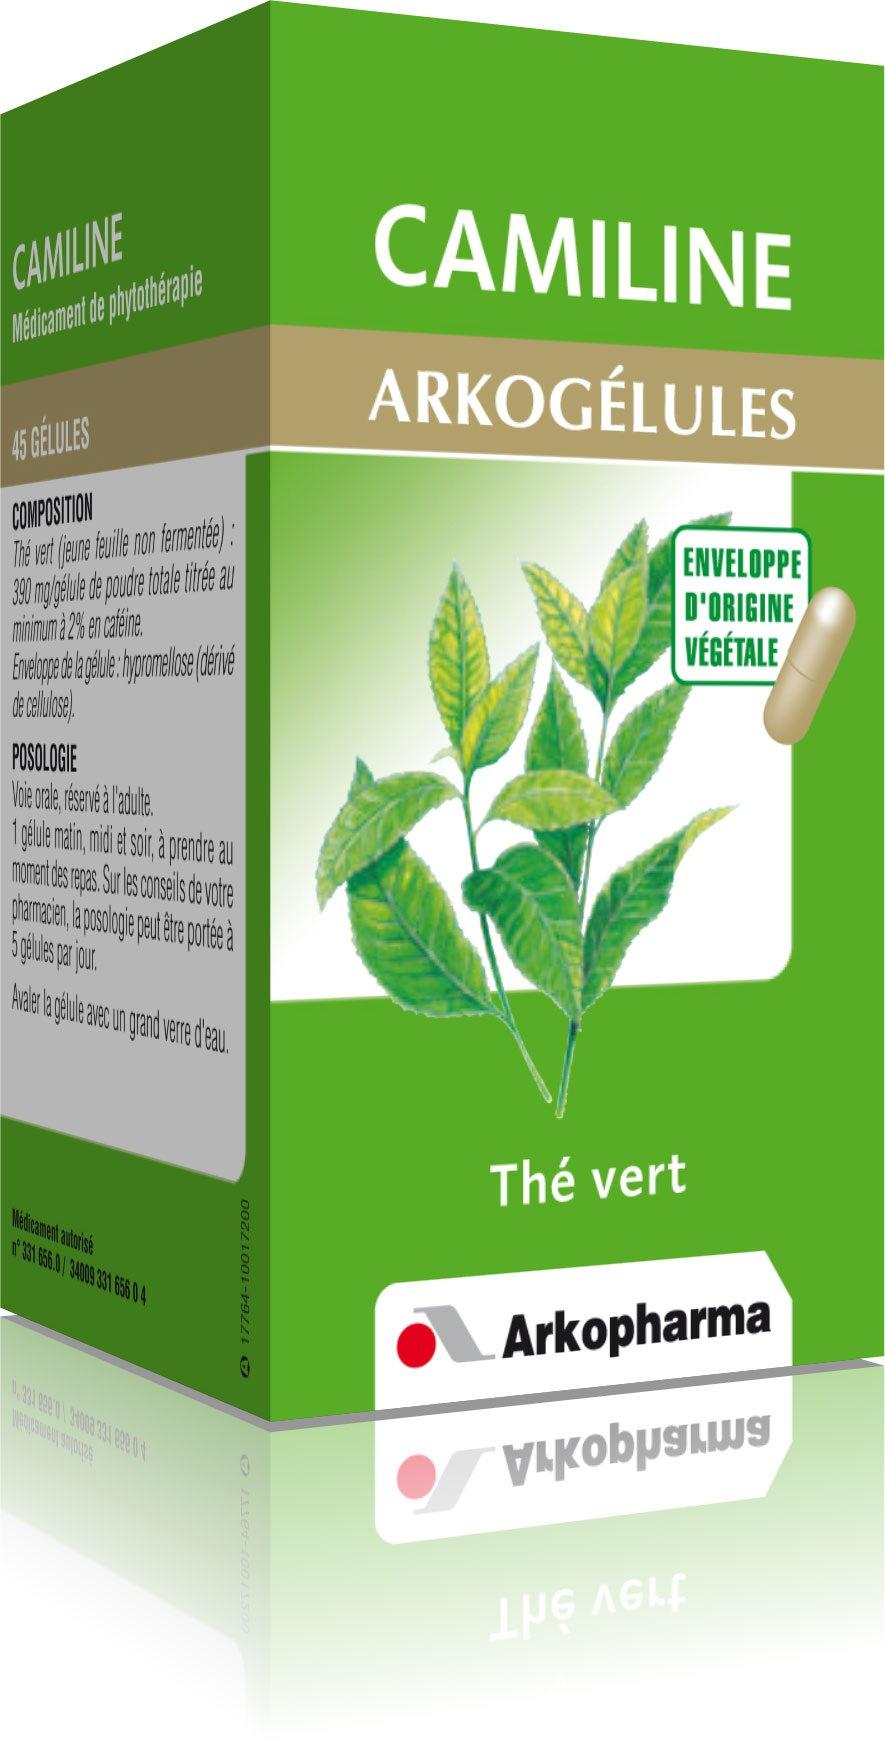 Prix d'ARKOPHARMA Arkogélules Camiline 390 mg - 45 gélules